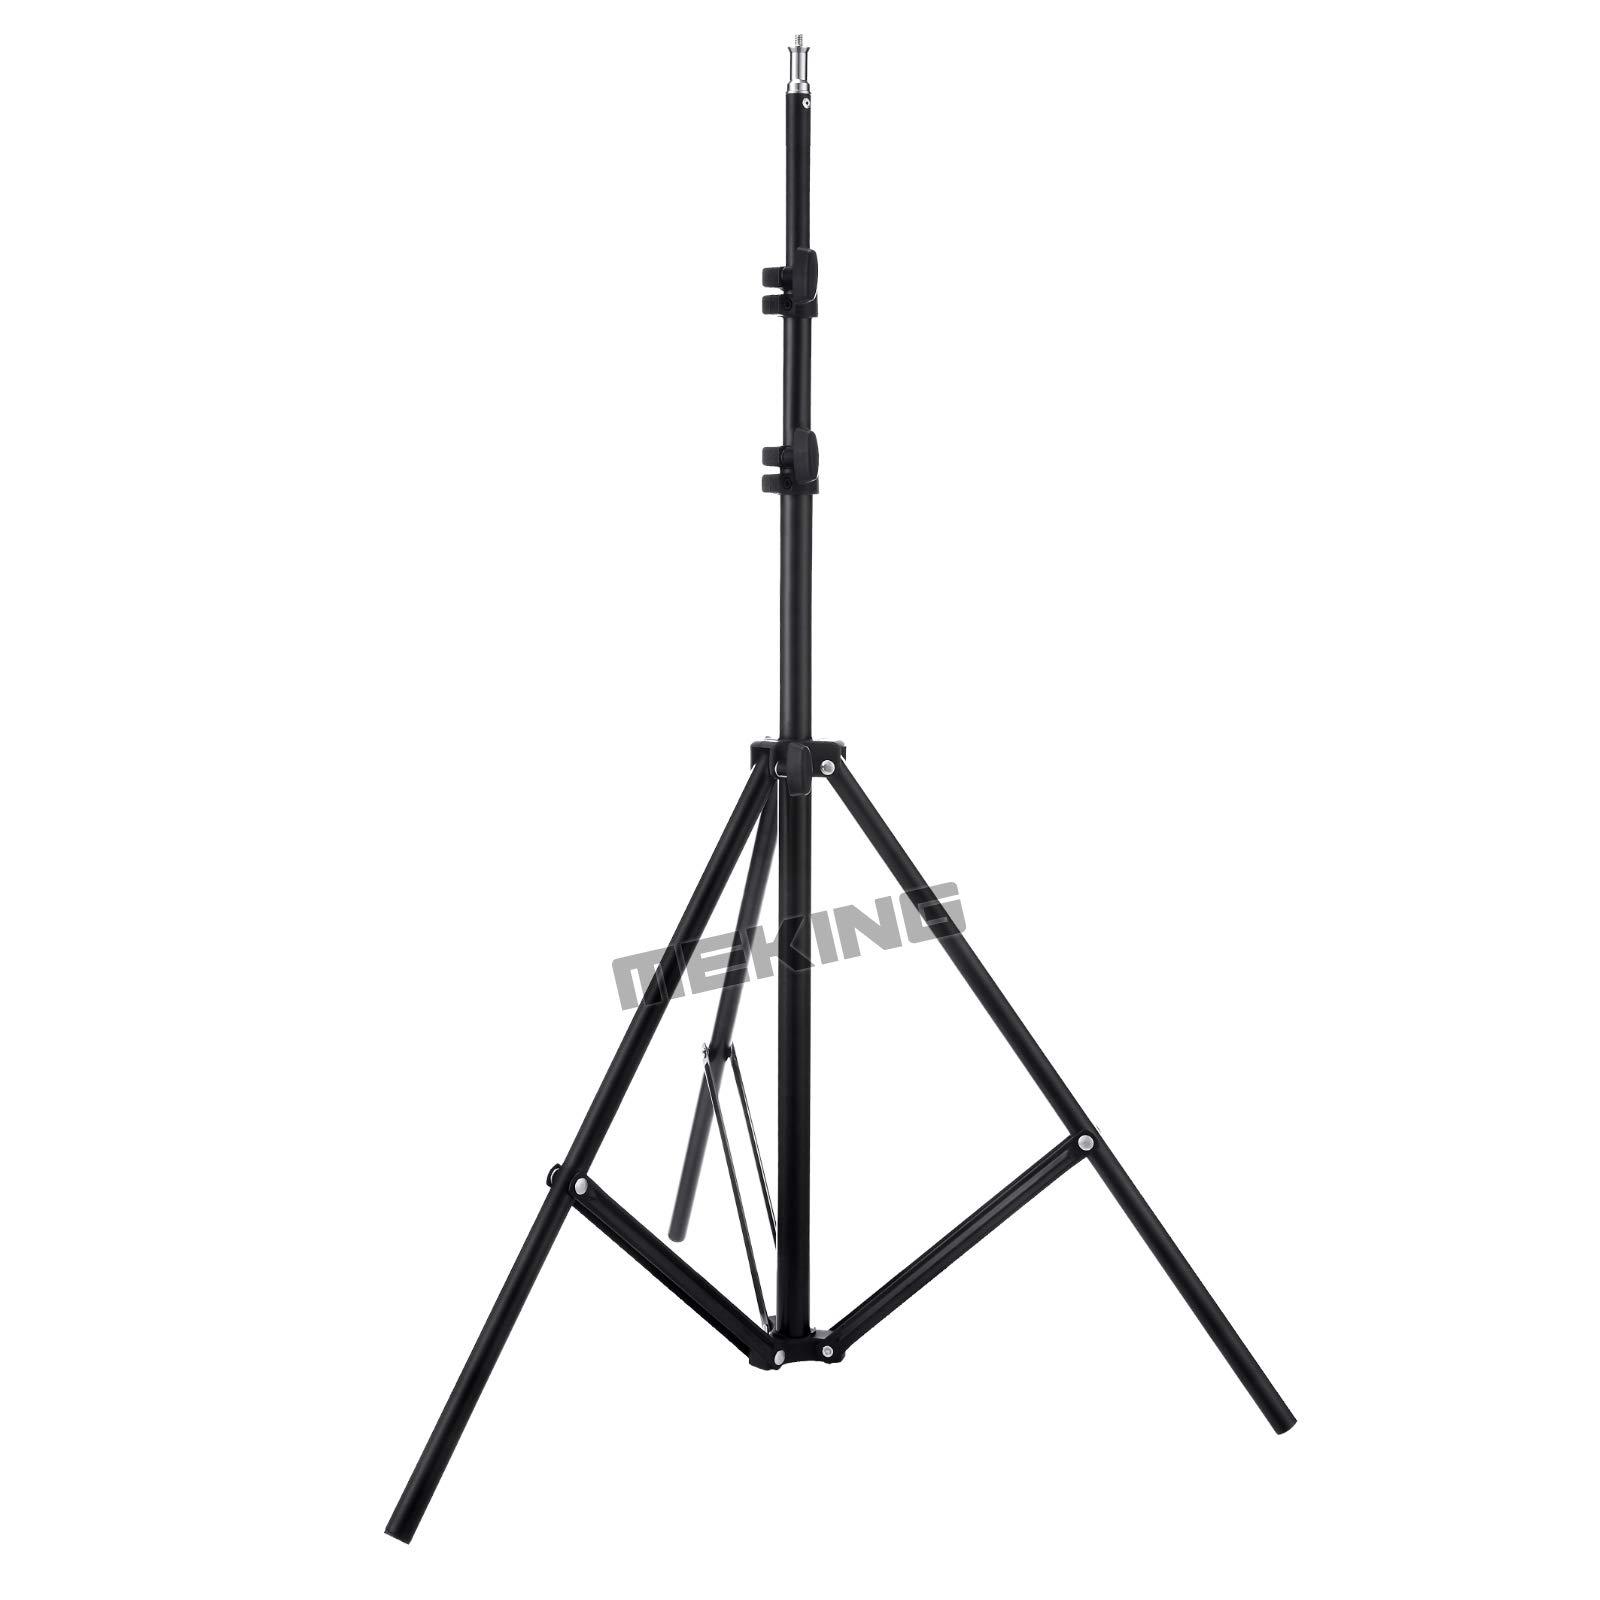 Meking Photography Telescopic Lighting Boom Arm Stand Kit with Light Stand + 78-138cm Boom Arm Holder + Light Bag + Sand bag for Photo Studio Shooting